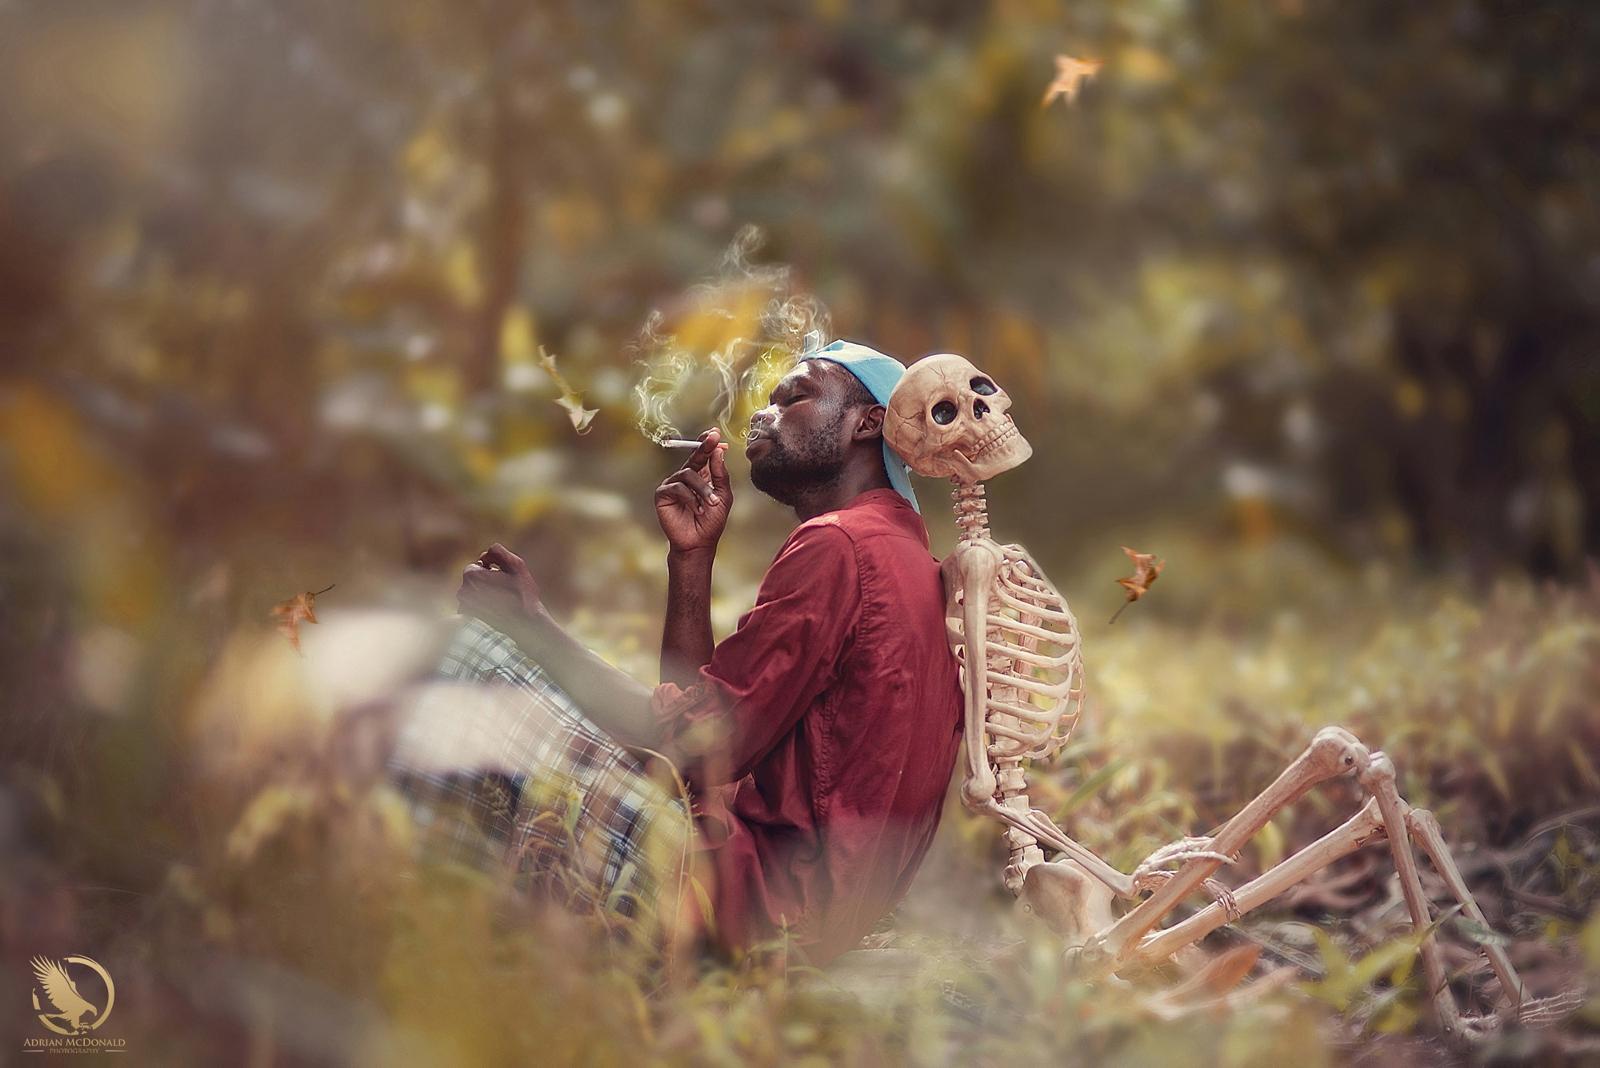 Adrian McDonald's Photography is 'Like an Awareness Pill'